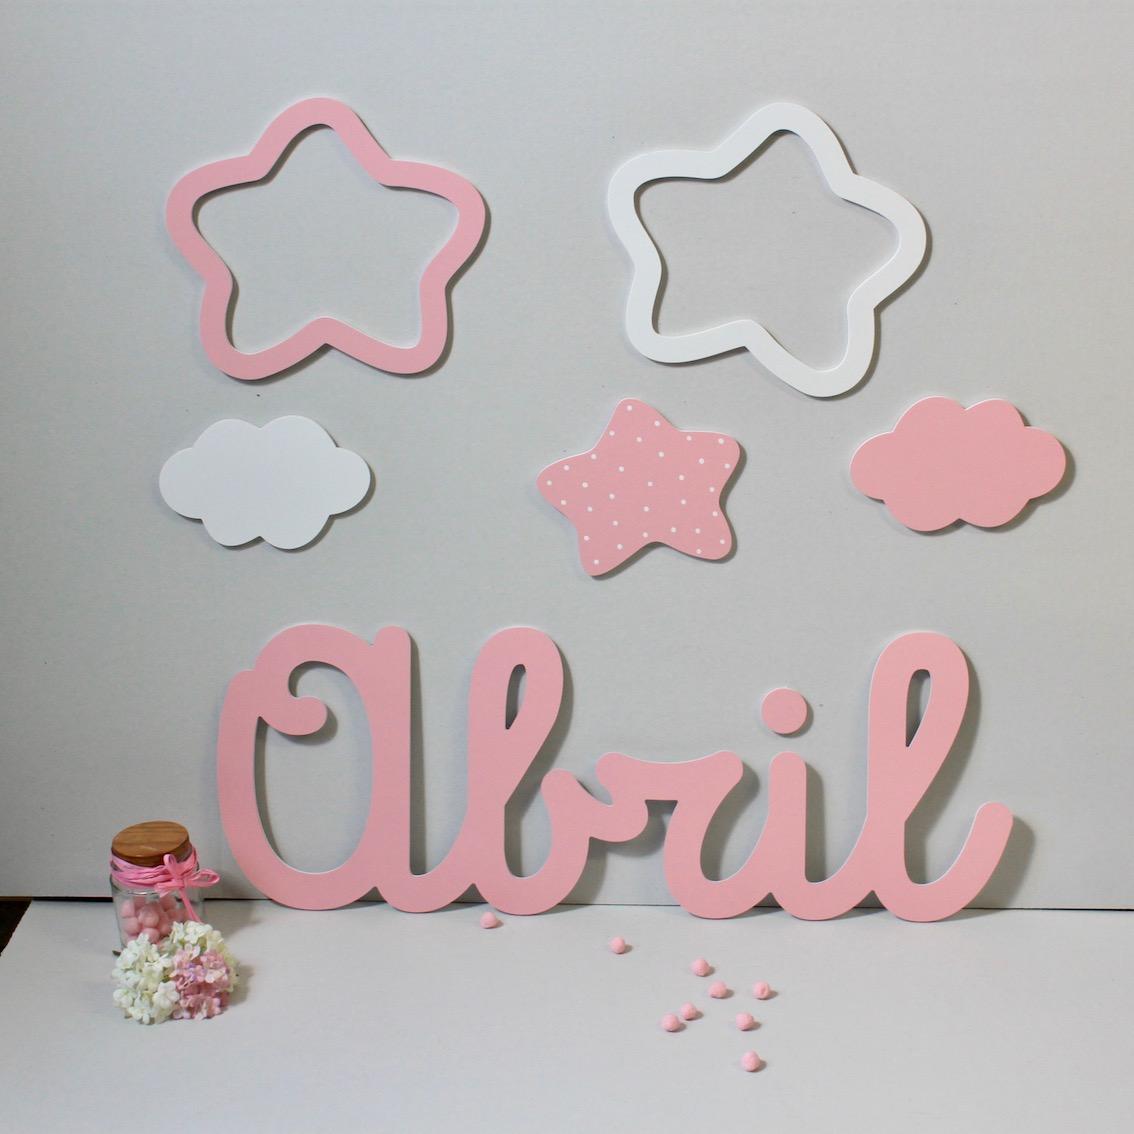 Letras infantiles para decorar stunning fabulous letras - Letras infantiles para decorar ...